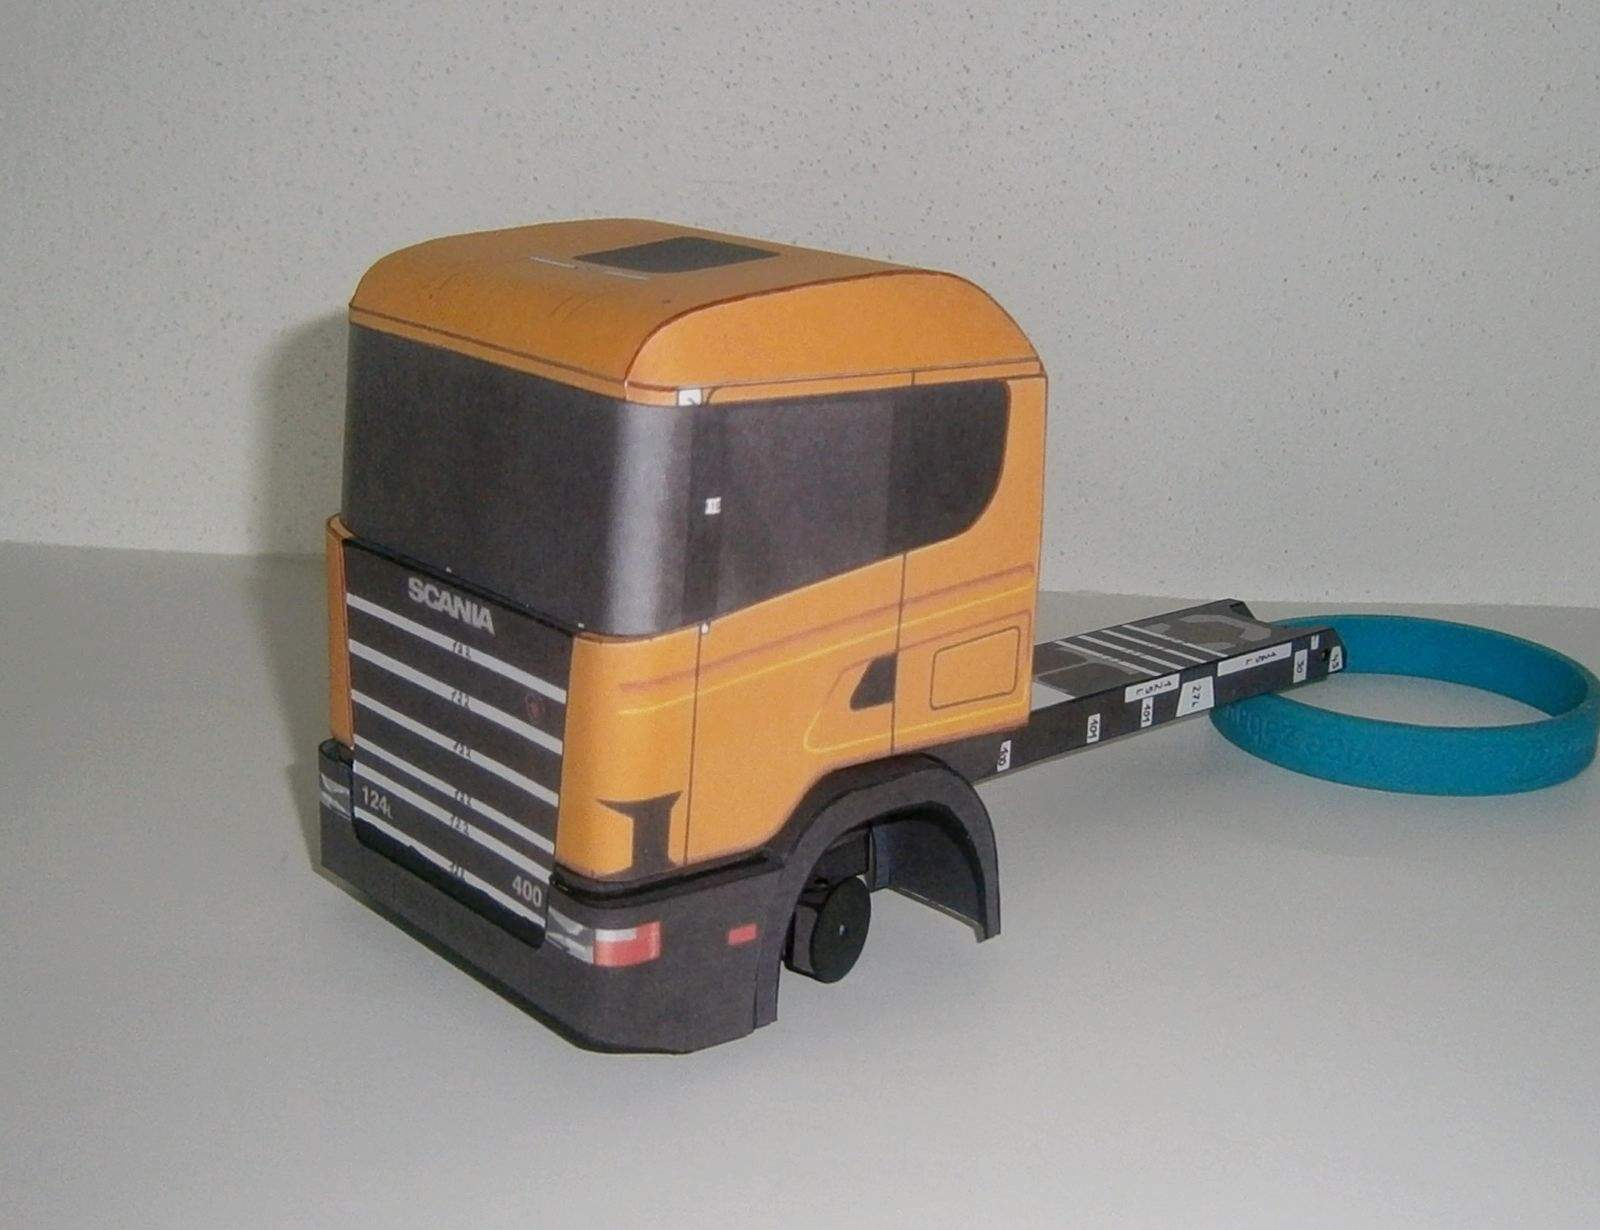 Scania 124L + kontejnerový návěs